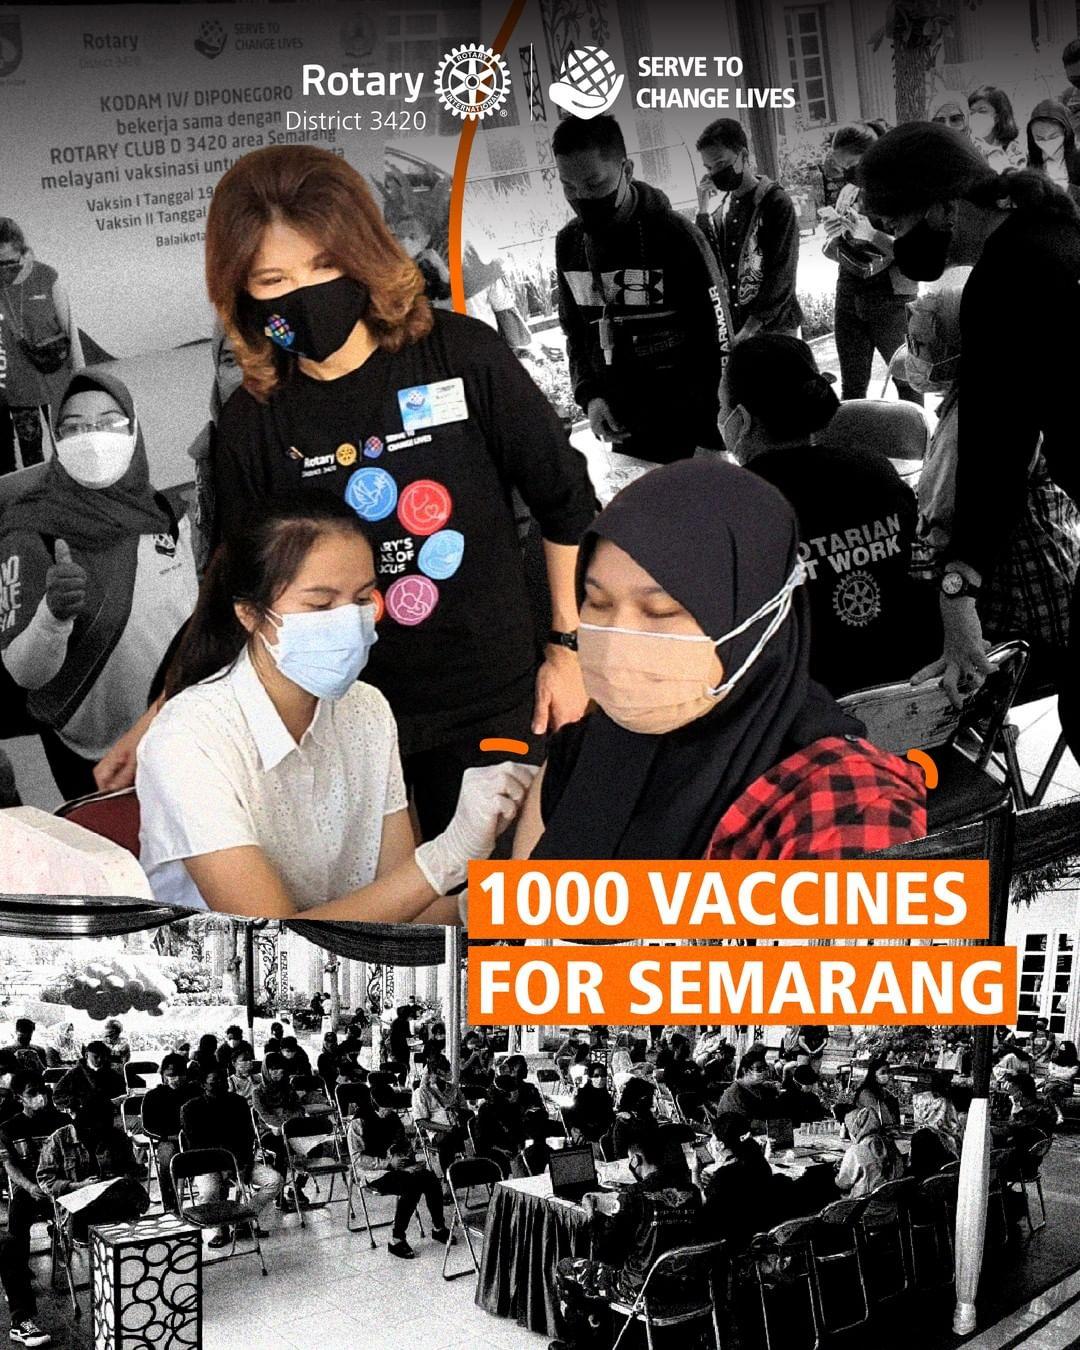 1000 Vaccines for Semarang